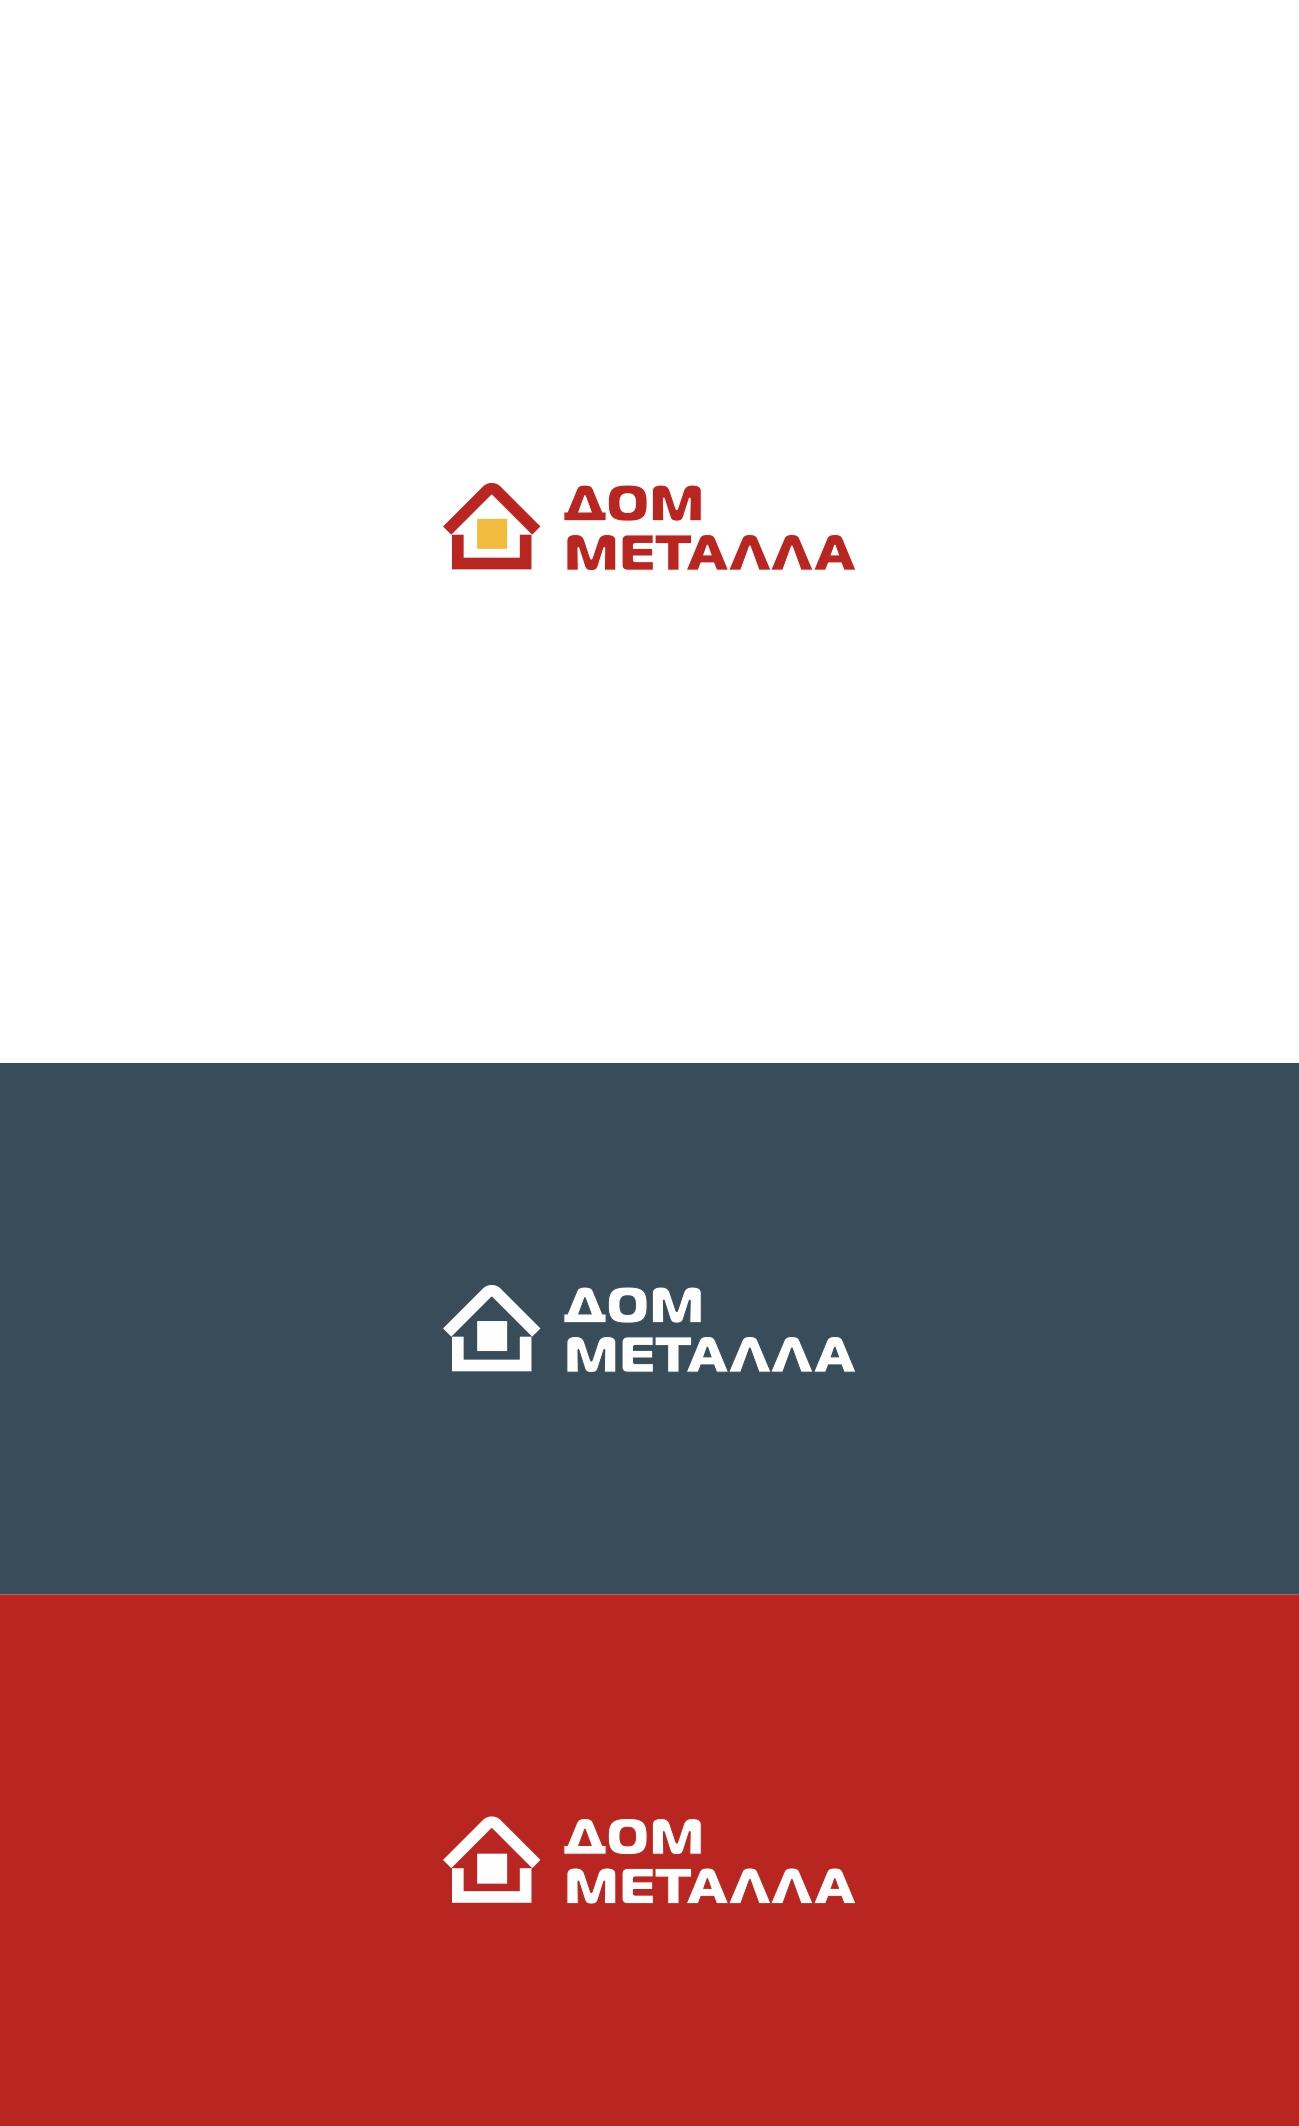 Разработка логотипа фото f_5055c596b87c5dcb.jpg